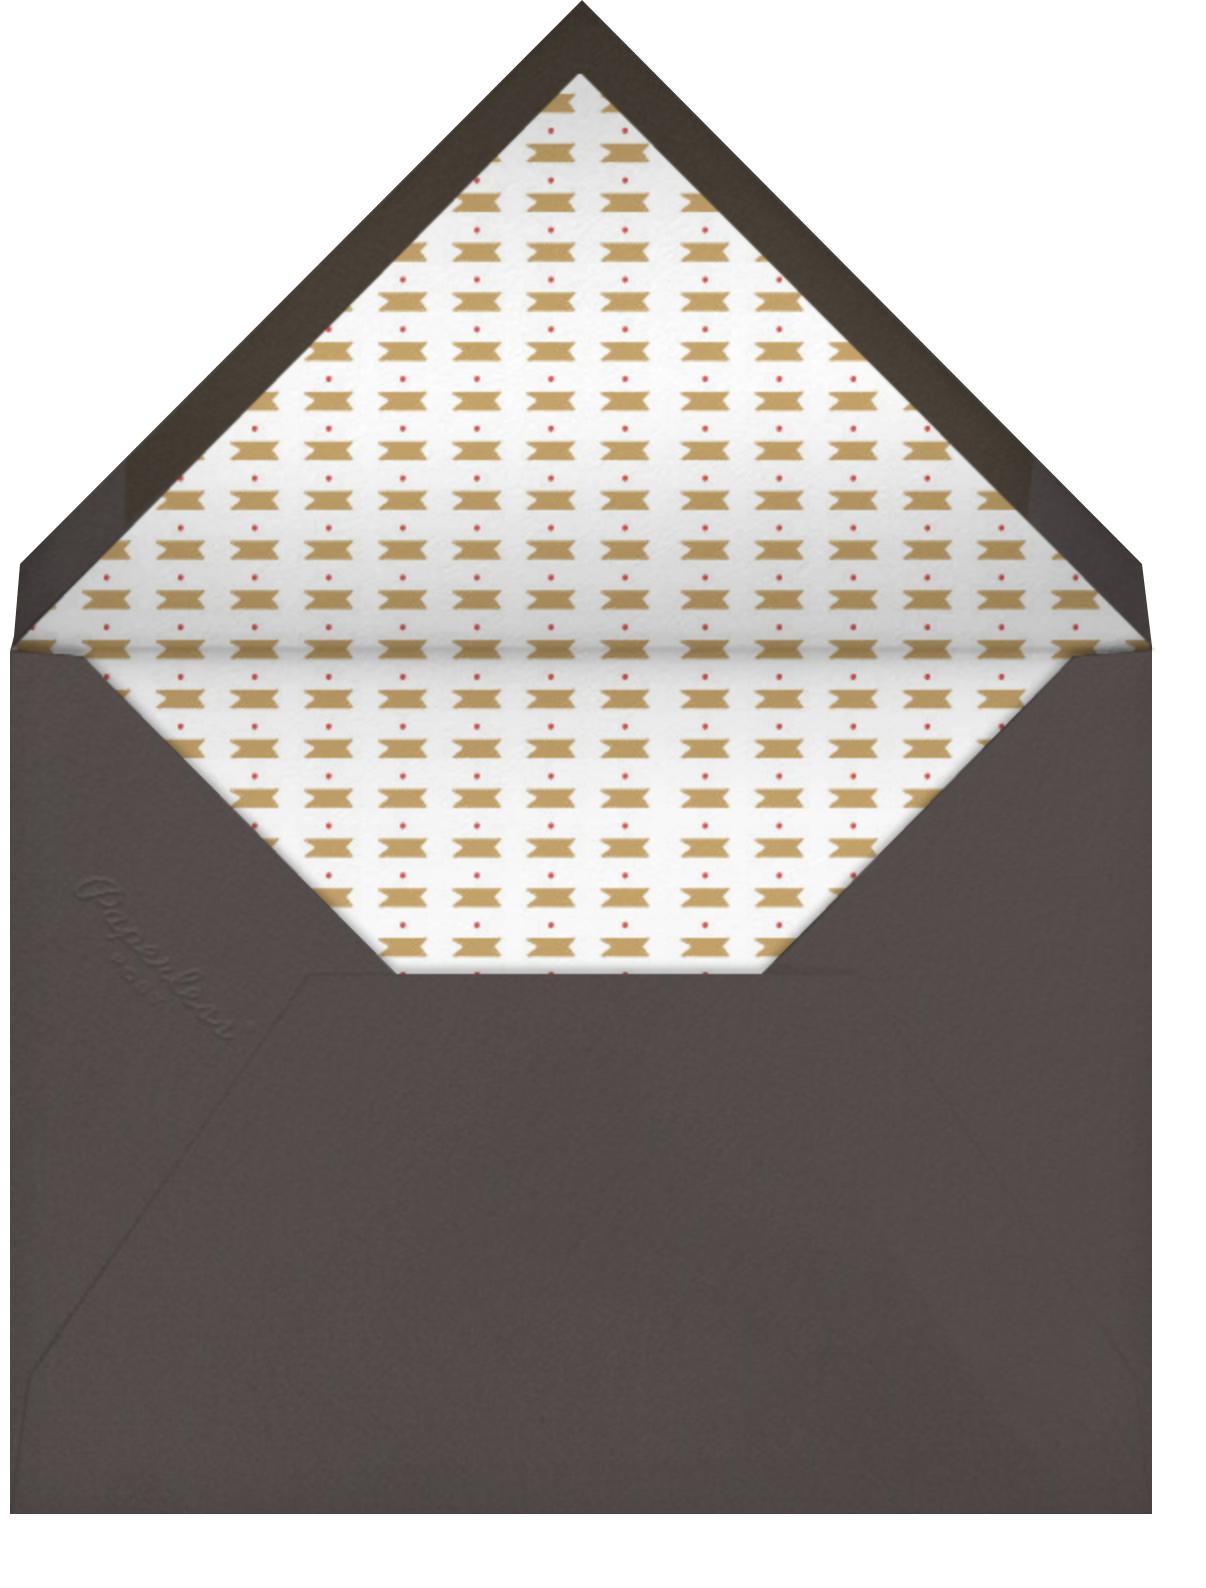 Meet Me at Midnight - Charcoal - Mr. Boddington's Studio - Engagement party - envelope back